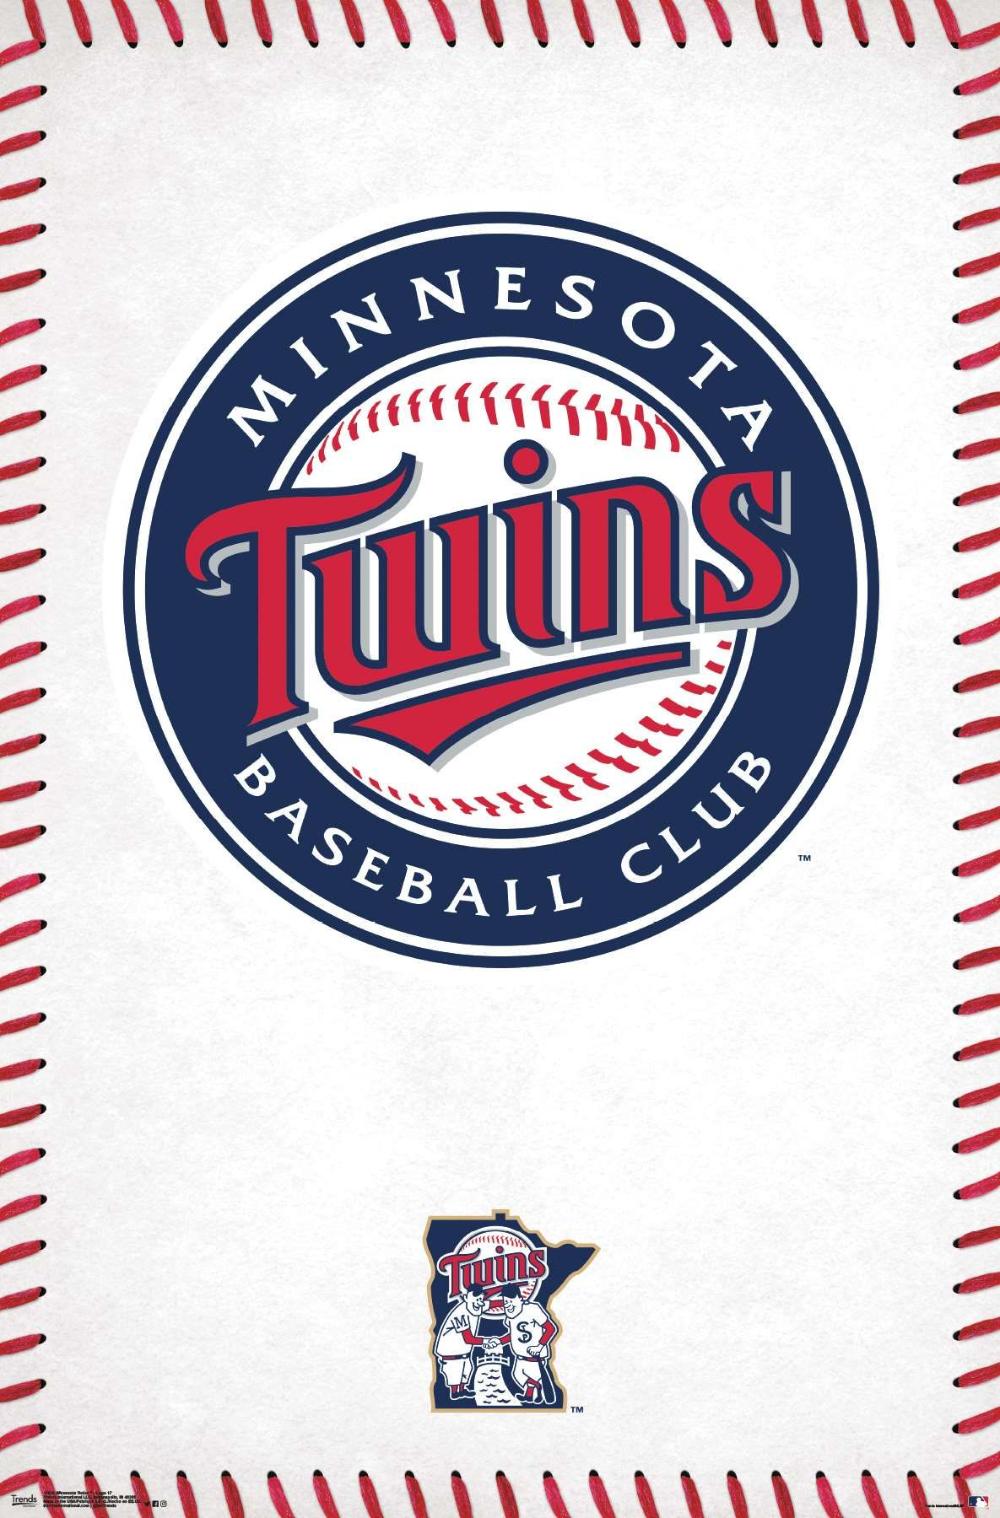 Mlb Minnesota Twins Logo In 2020 Minnesota Twins Red Sox World Series Logos